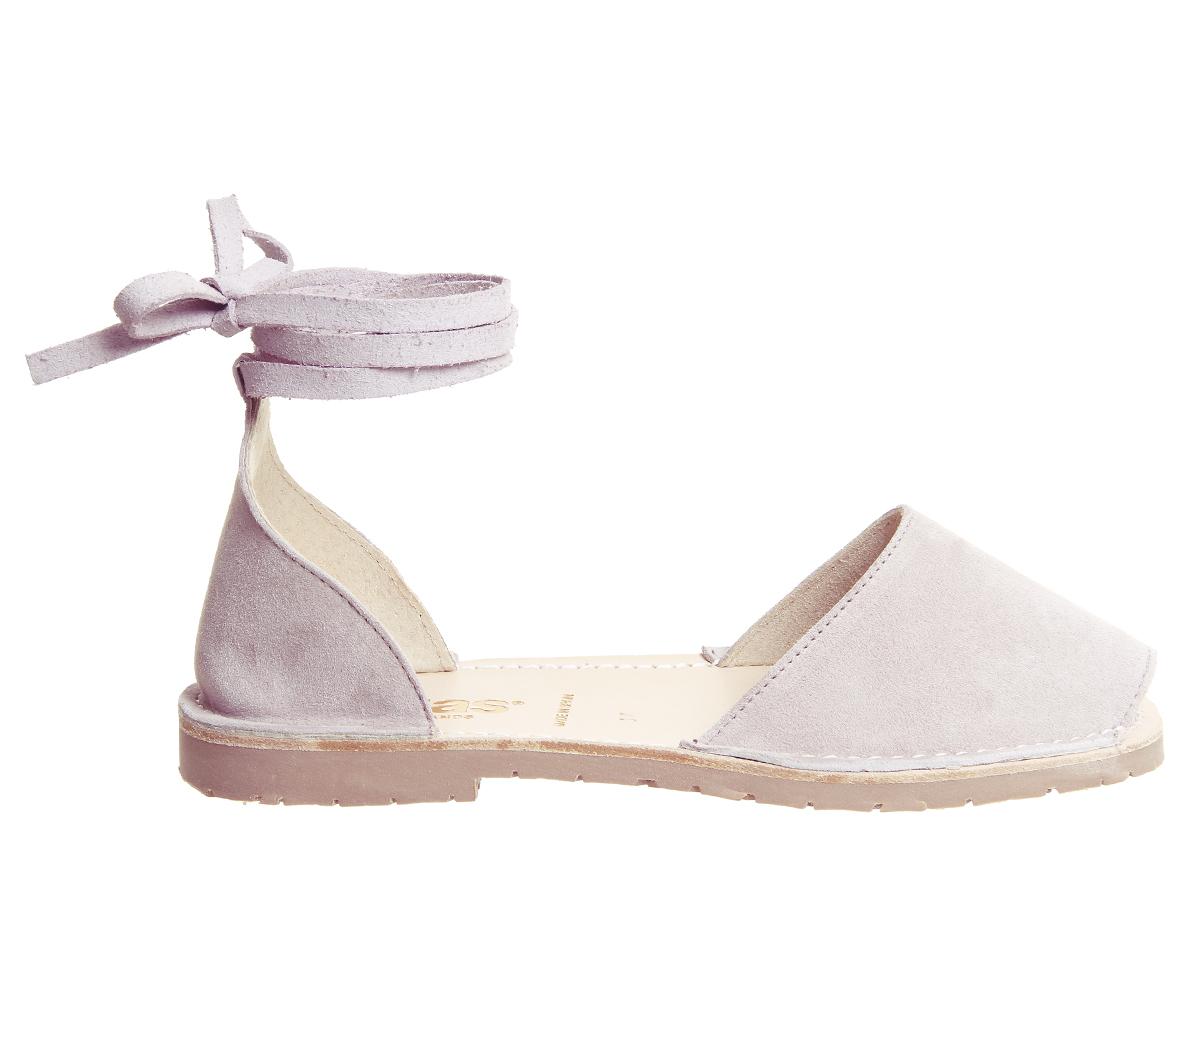 202cd7918c3f Sentinel Womens Solillas Ankle Tie Sandals Windchime Grey Sandals